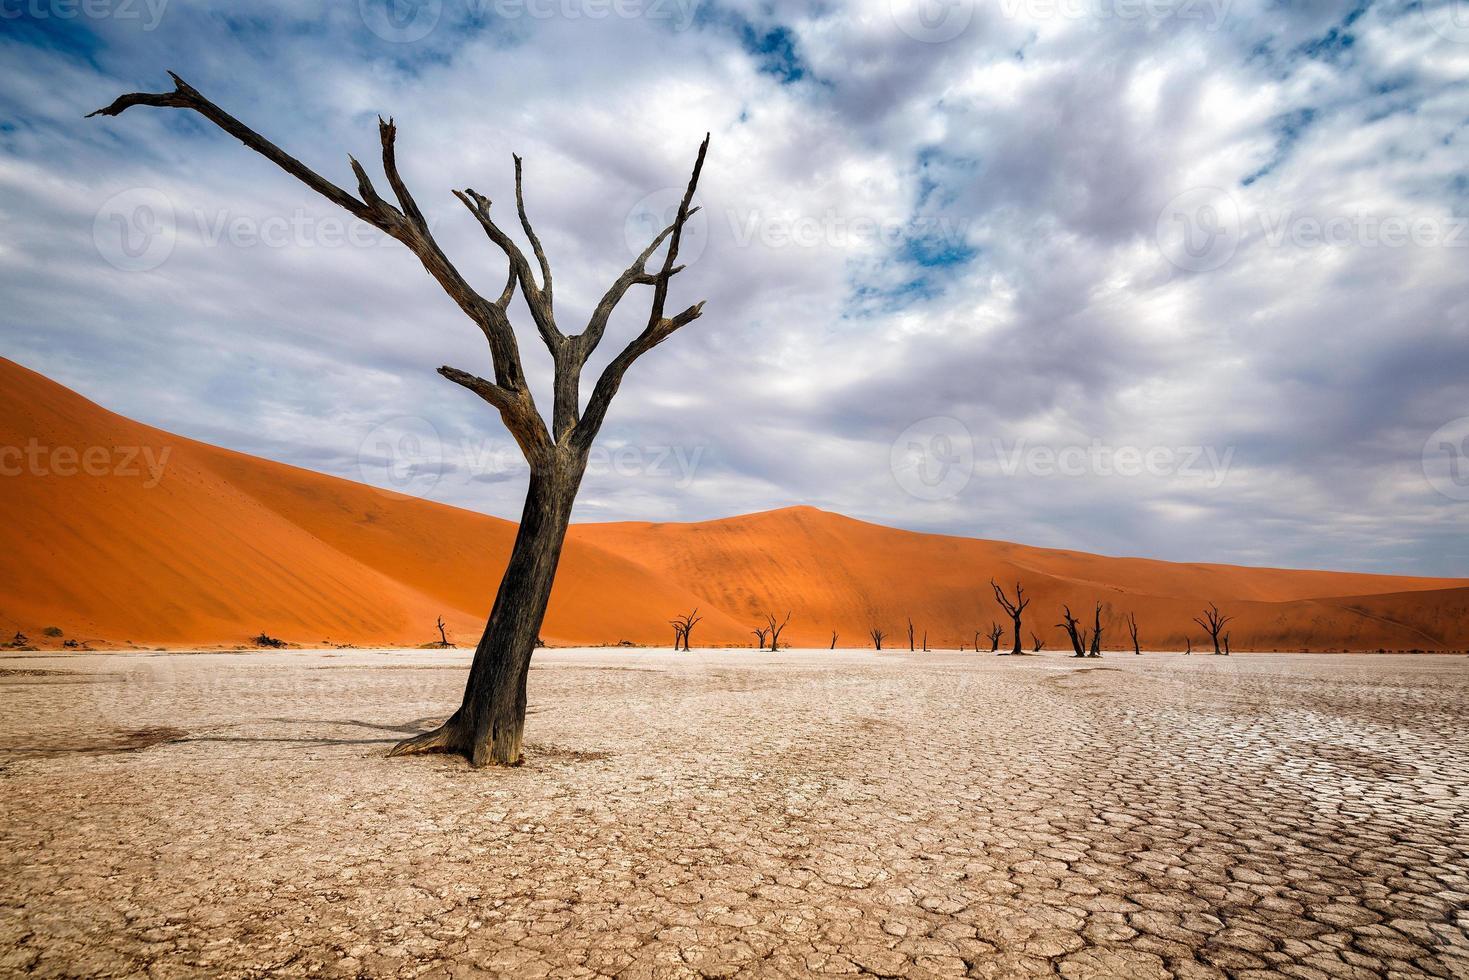 árvores mortas no parque vlei naukluft, namíbia foto